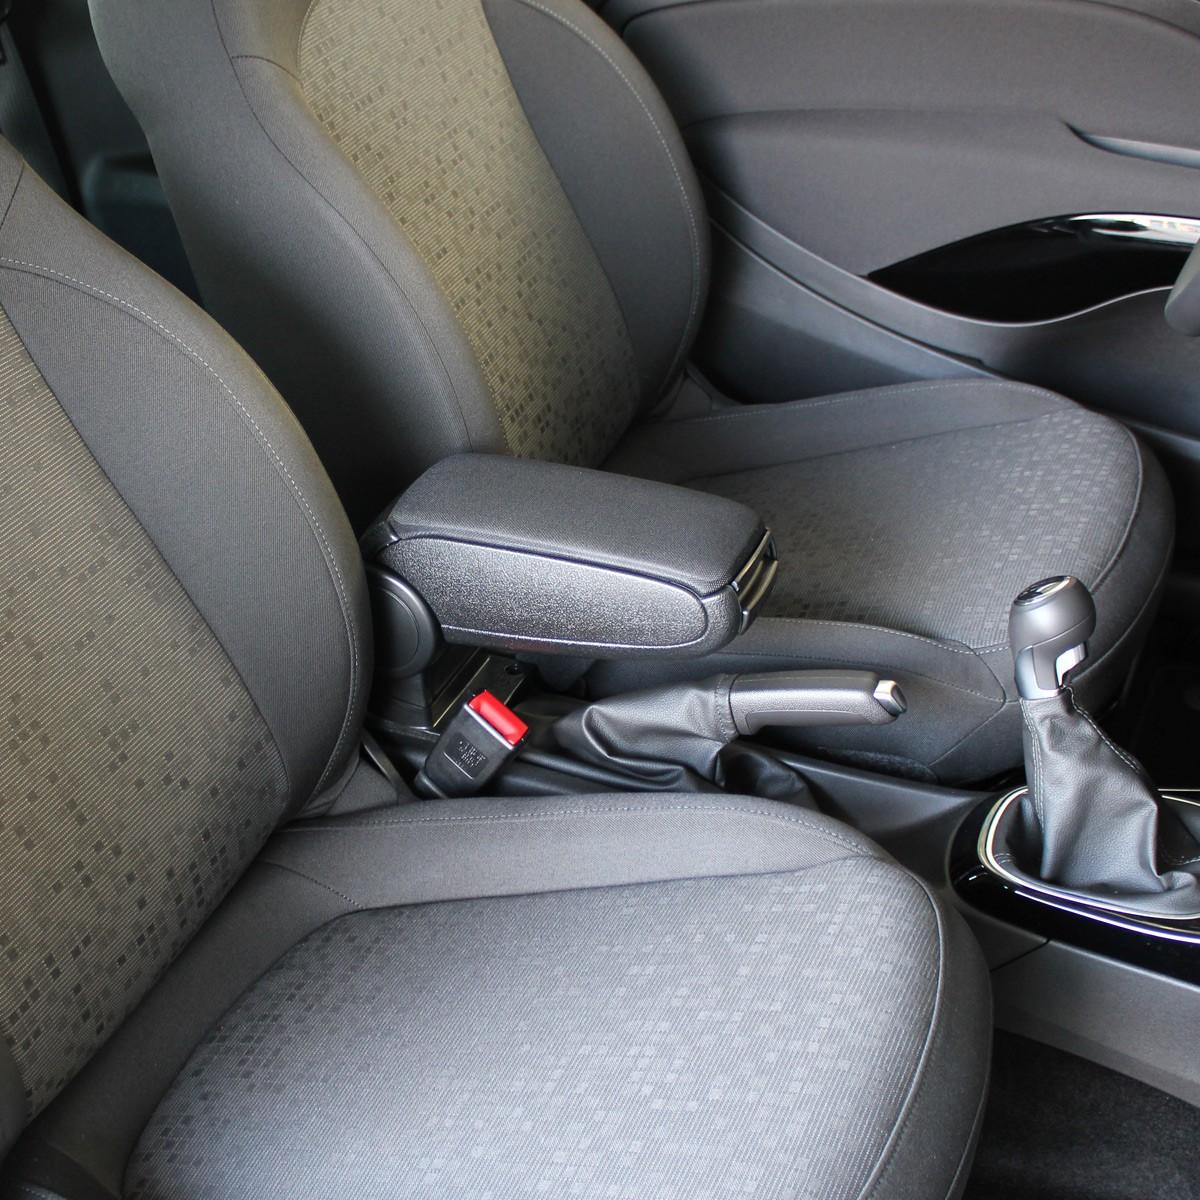 2016-2018 Accoudoir central Chevrolet Spark tissu noir neuf